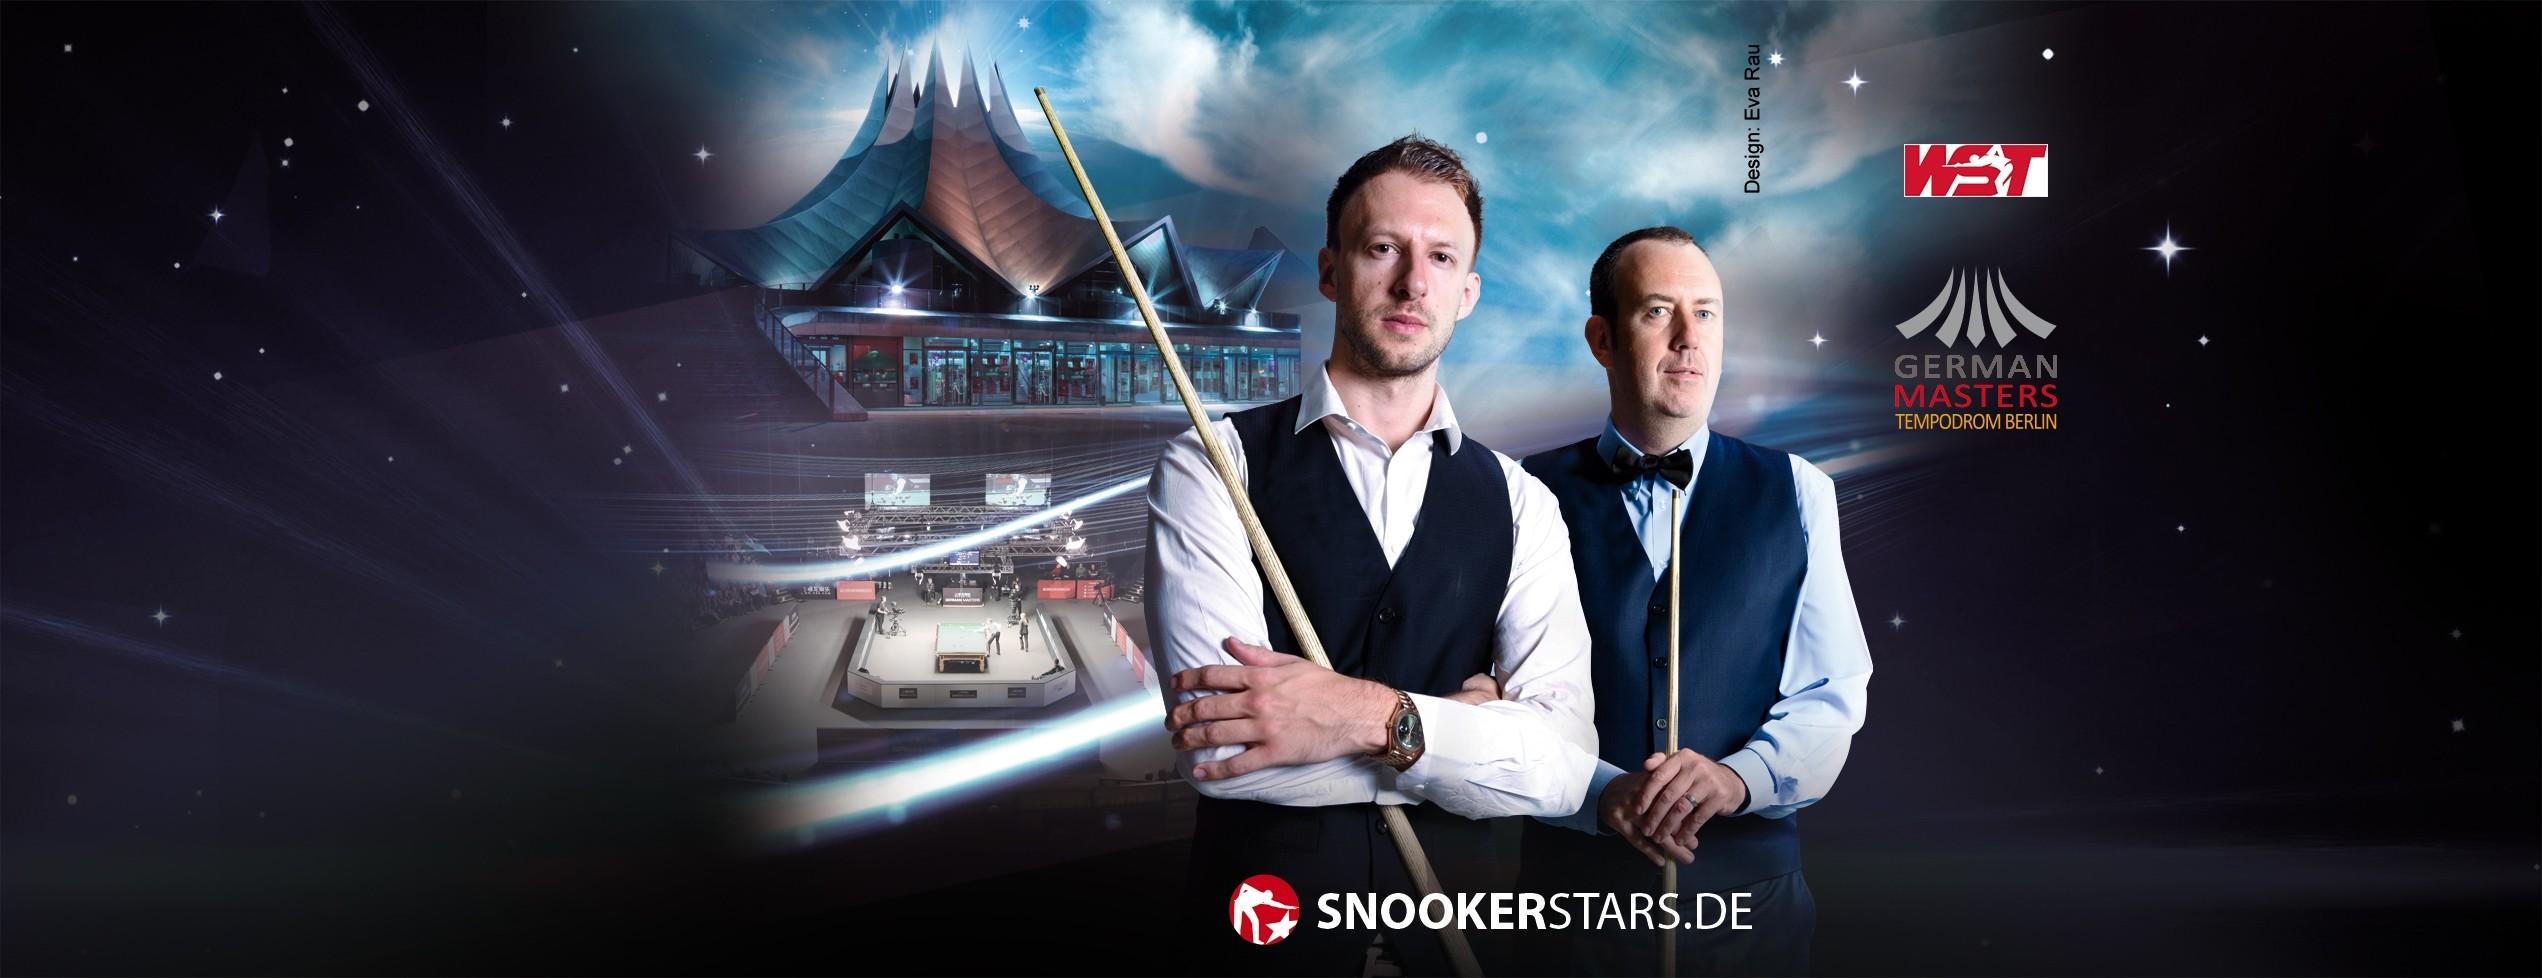 German Masters 27.01.2022 KAT 1 alle drei Sessions